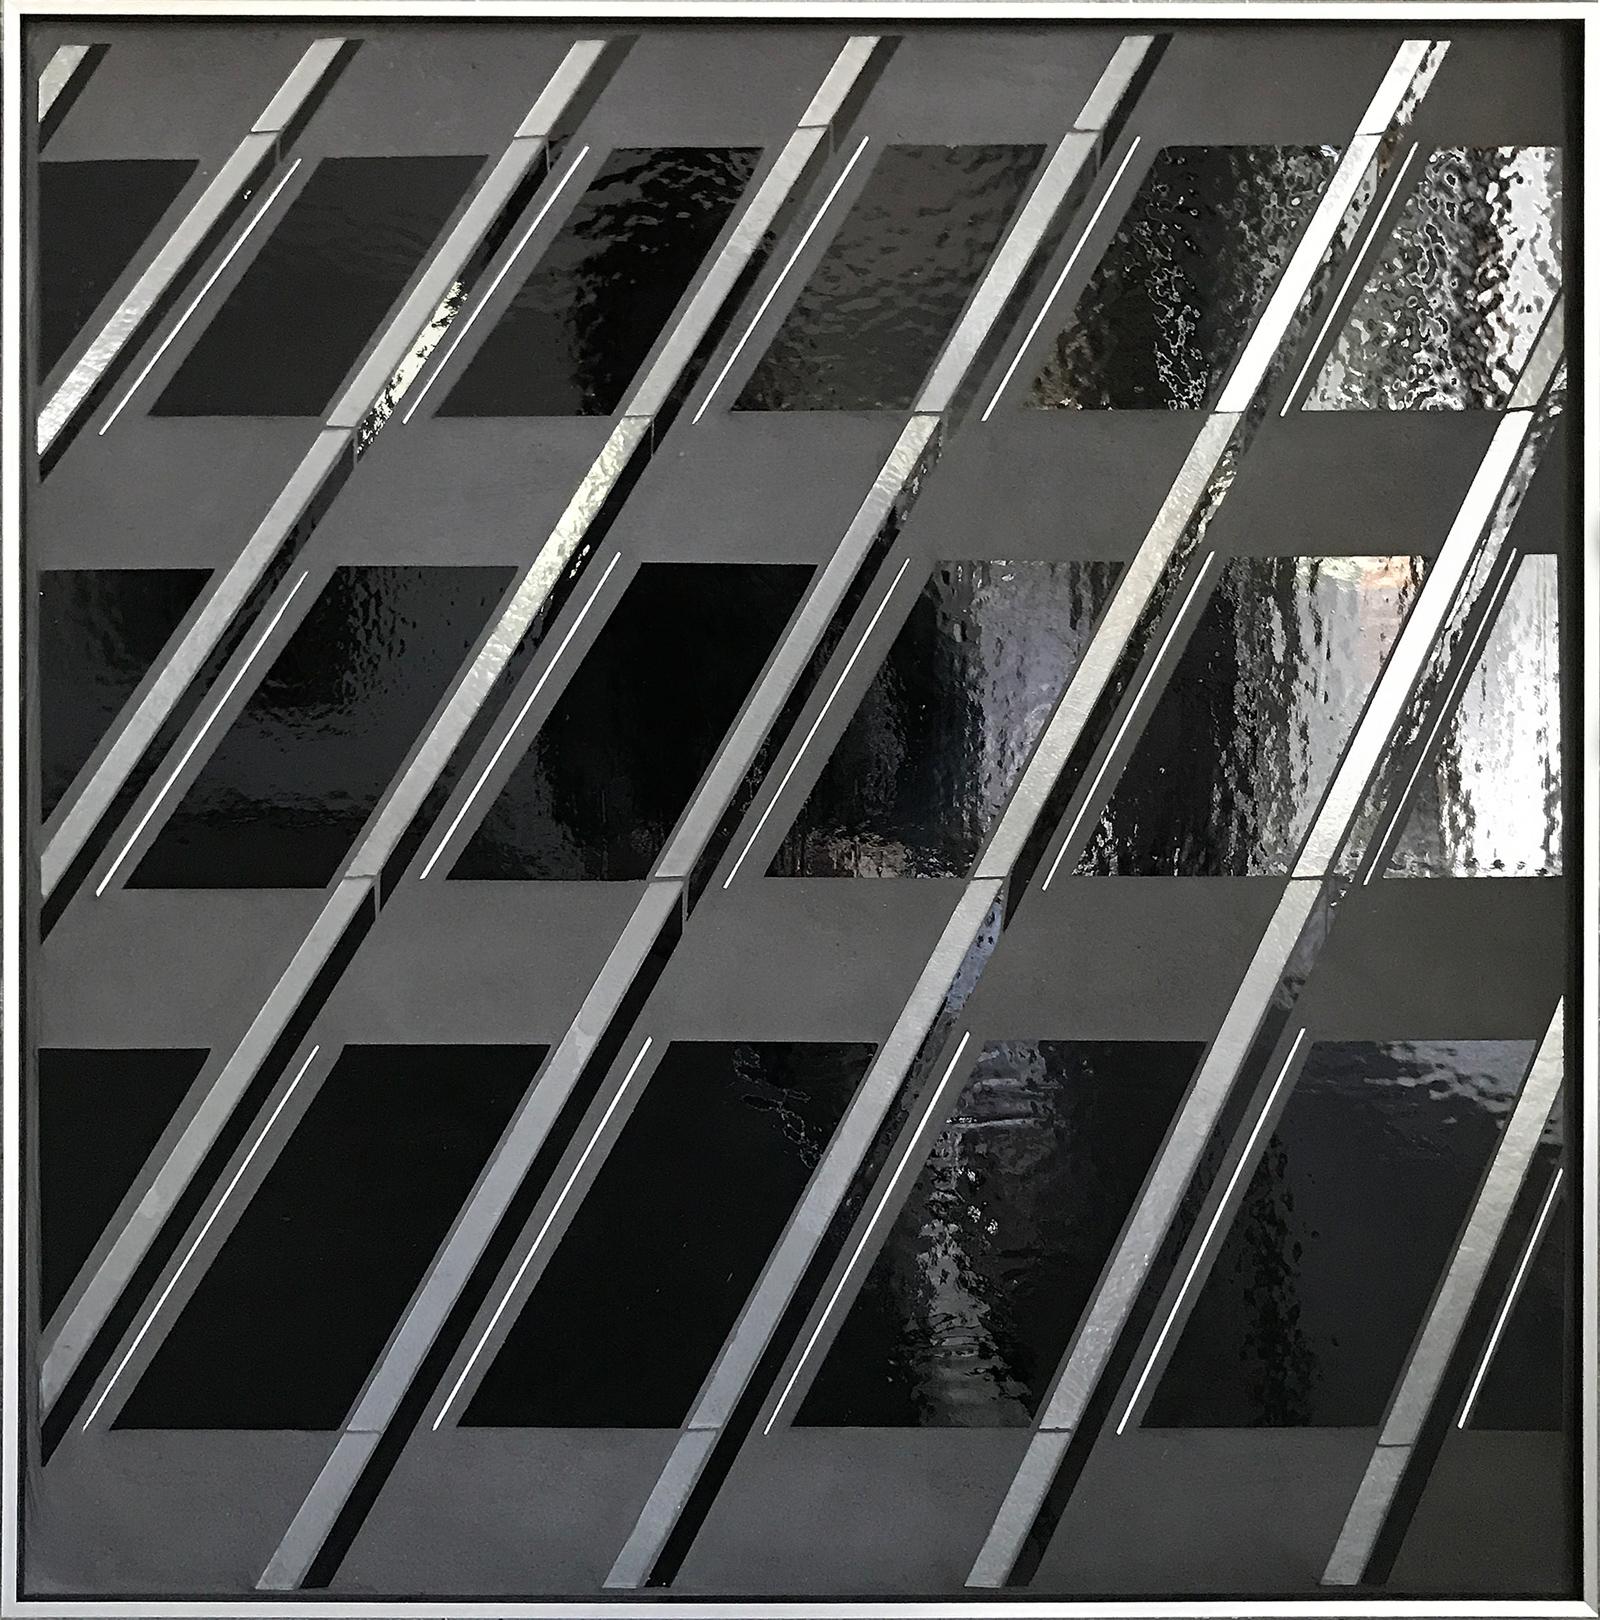 Reflect 1.19 Black grid